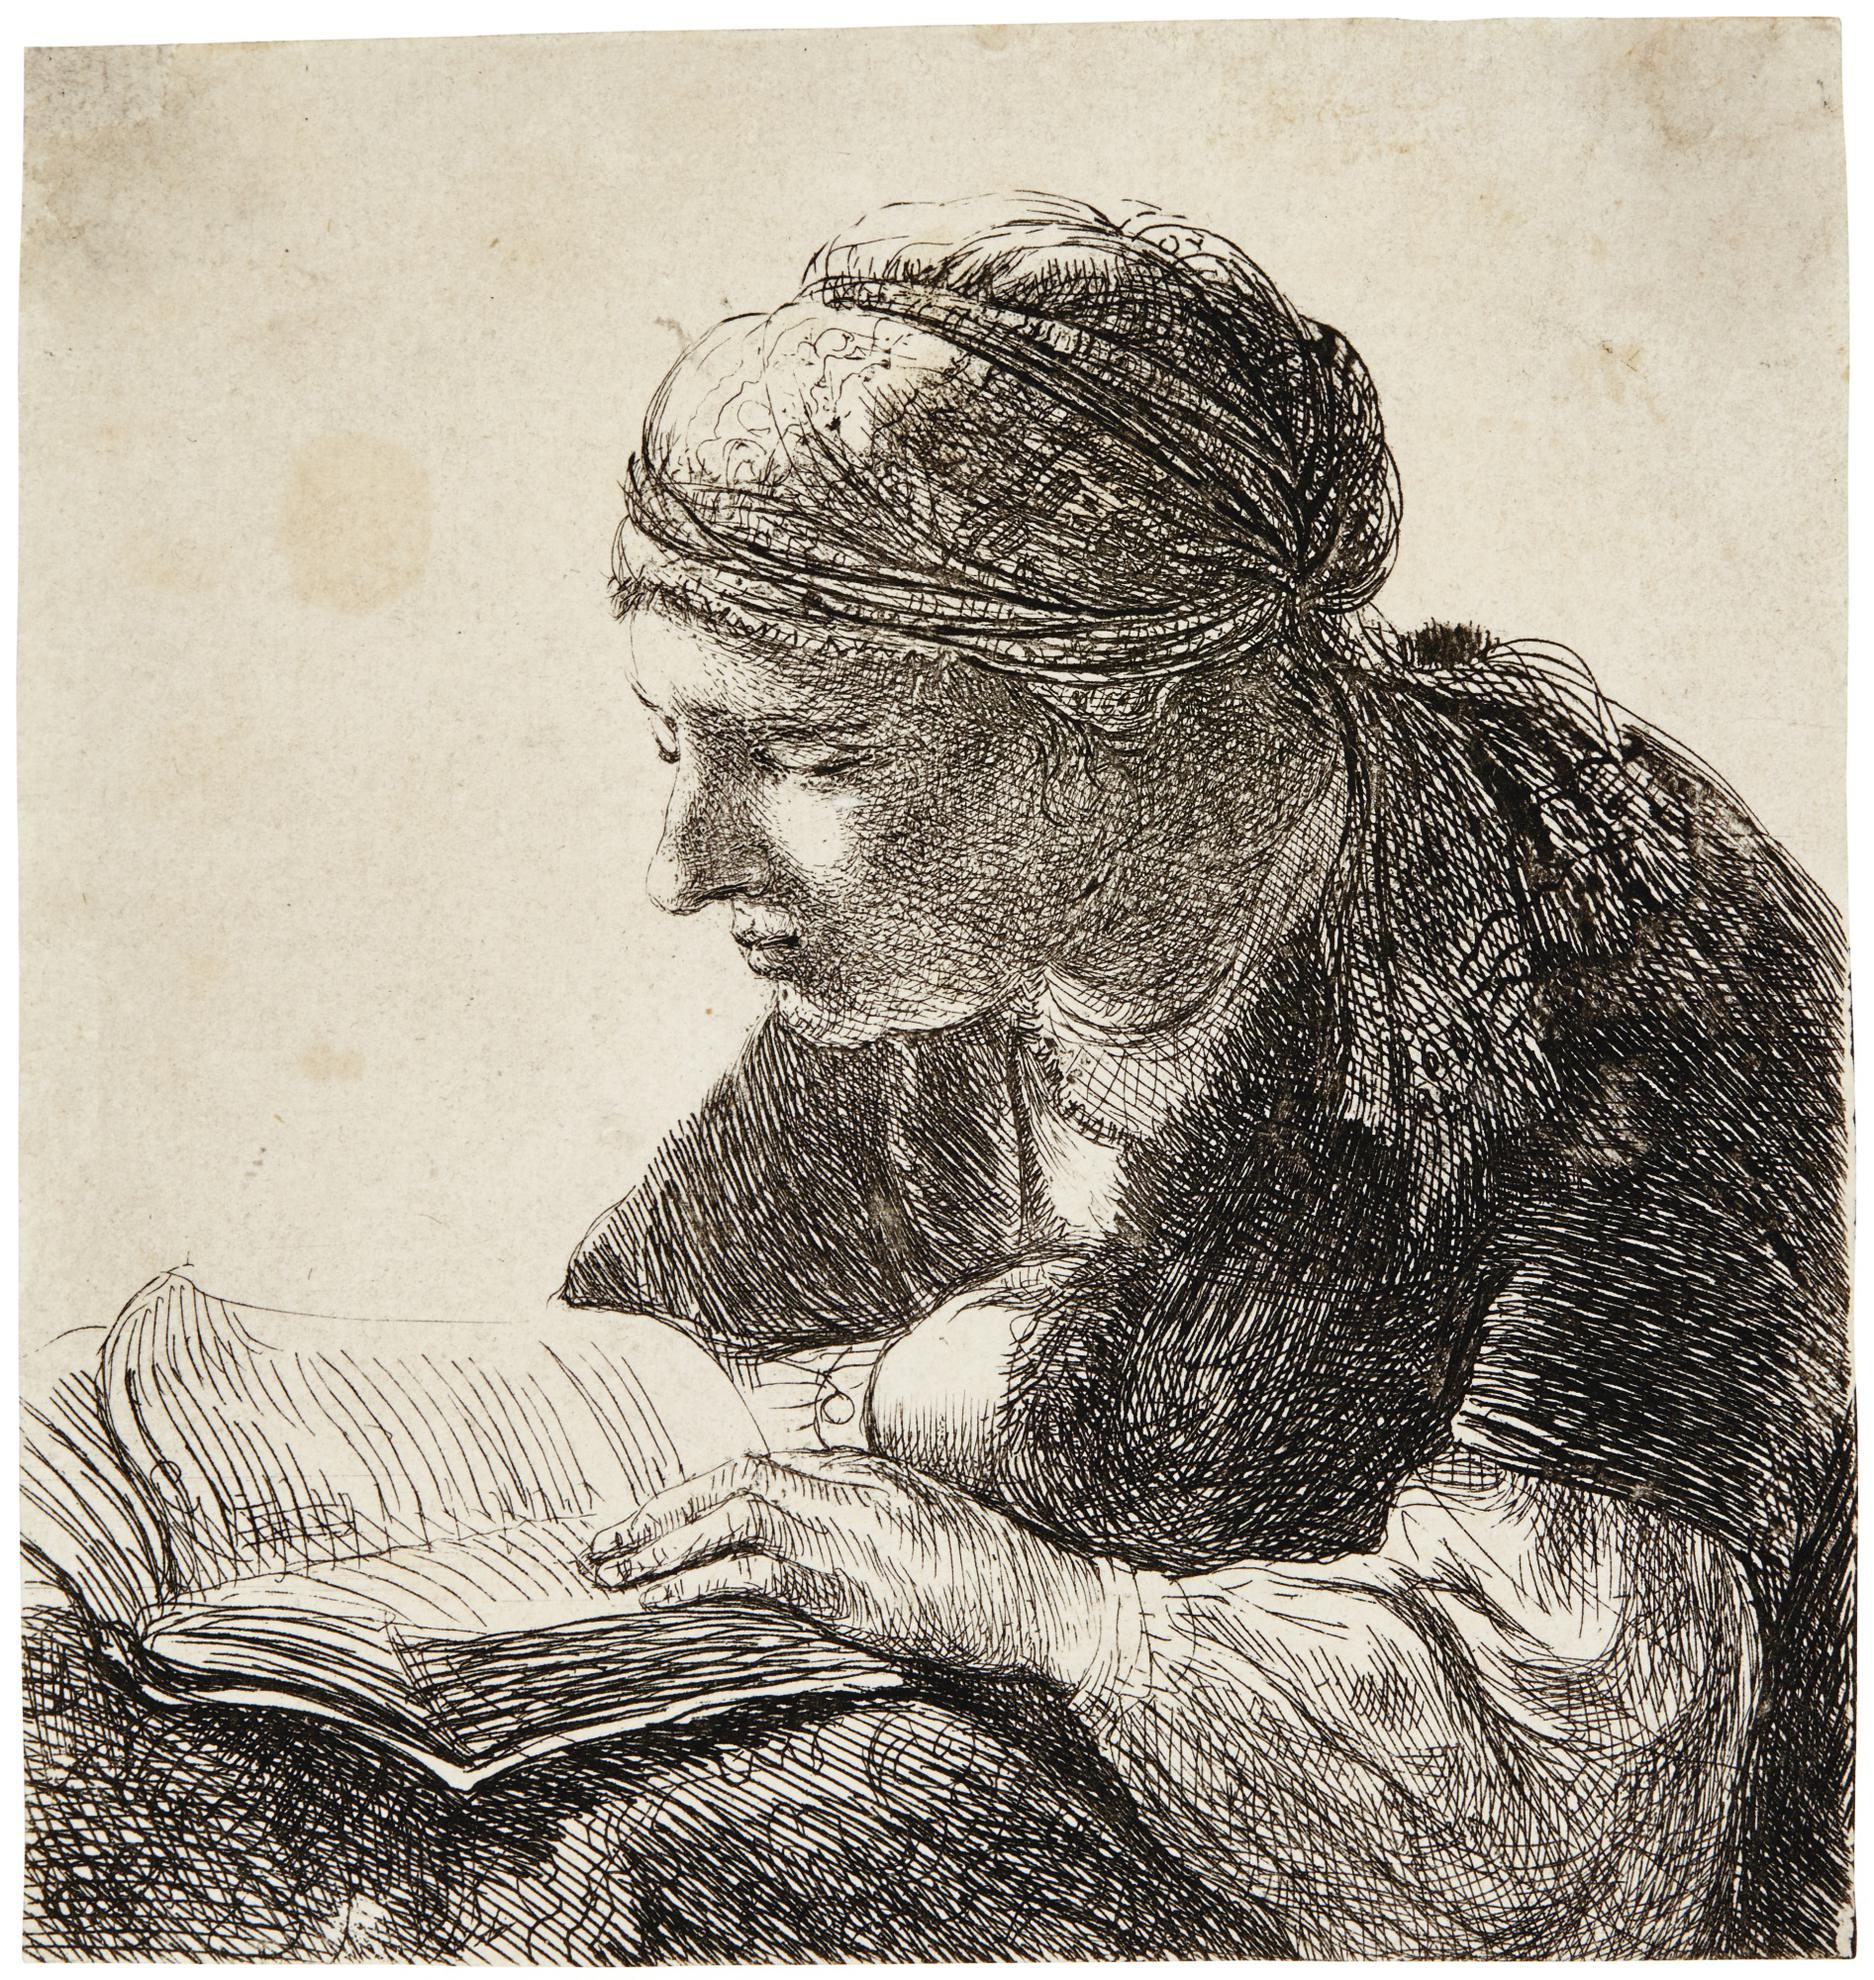 Rembrandt van Rijn-Woman Reading (B., Holl. 345; New Holl. 137; H. 113)-1634